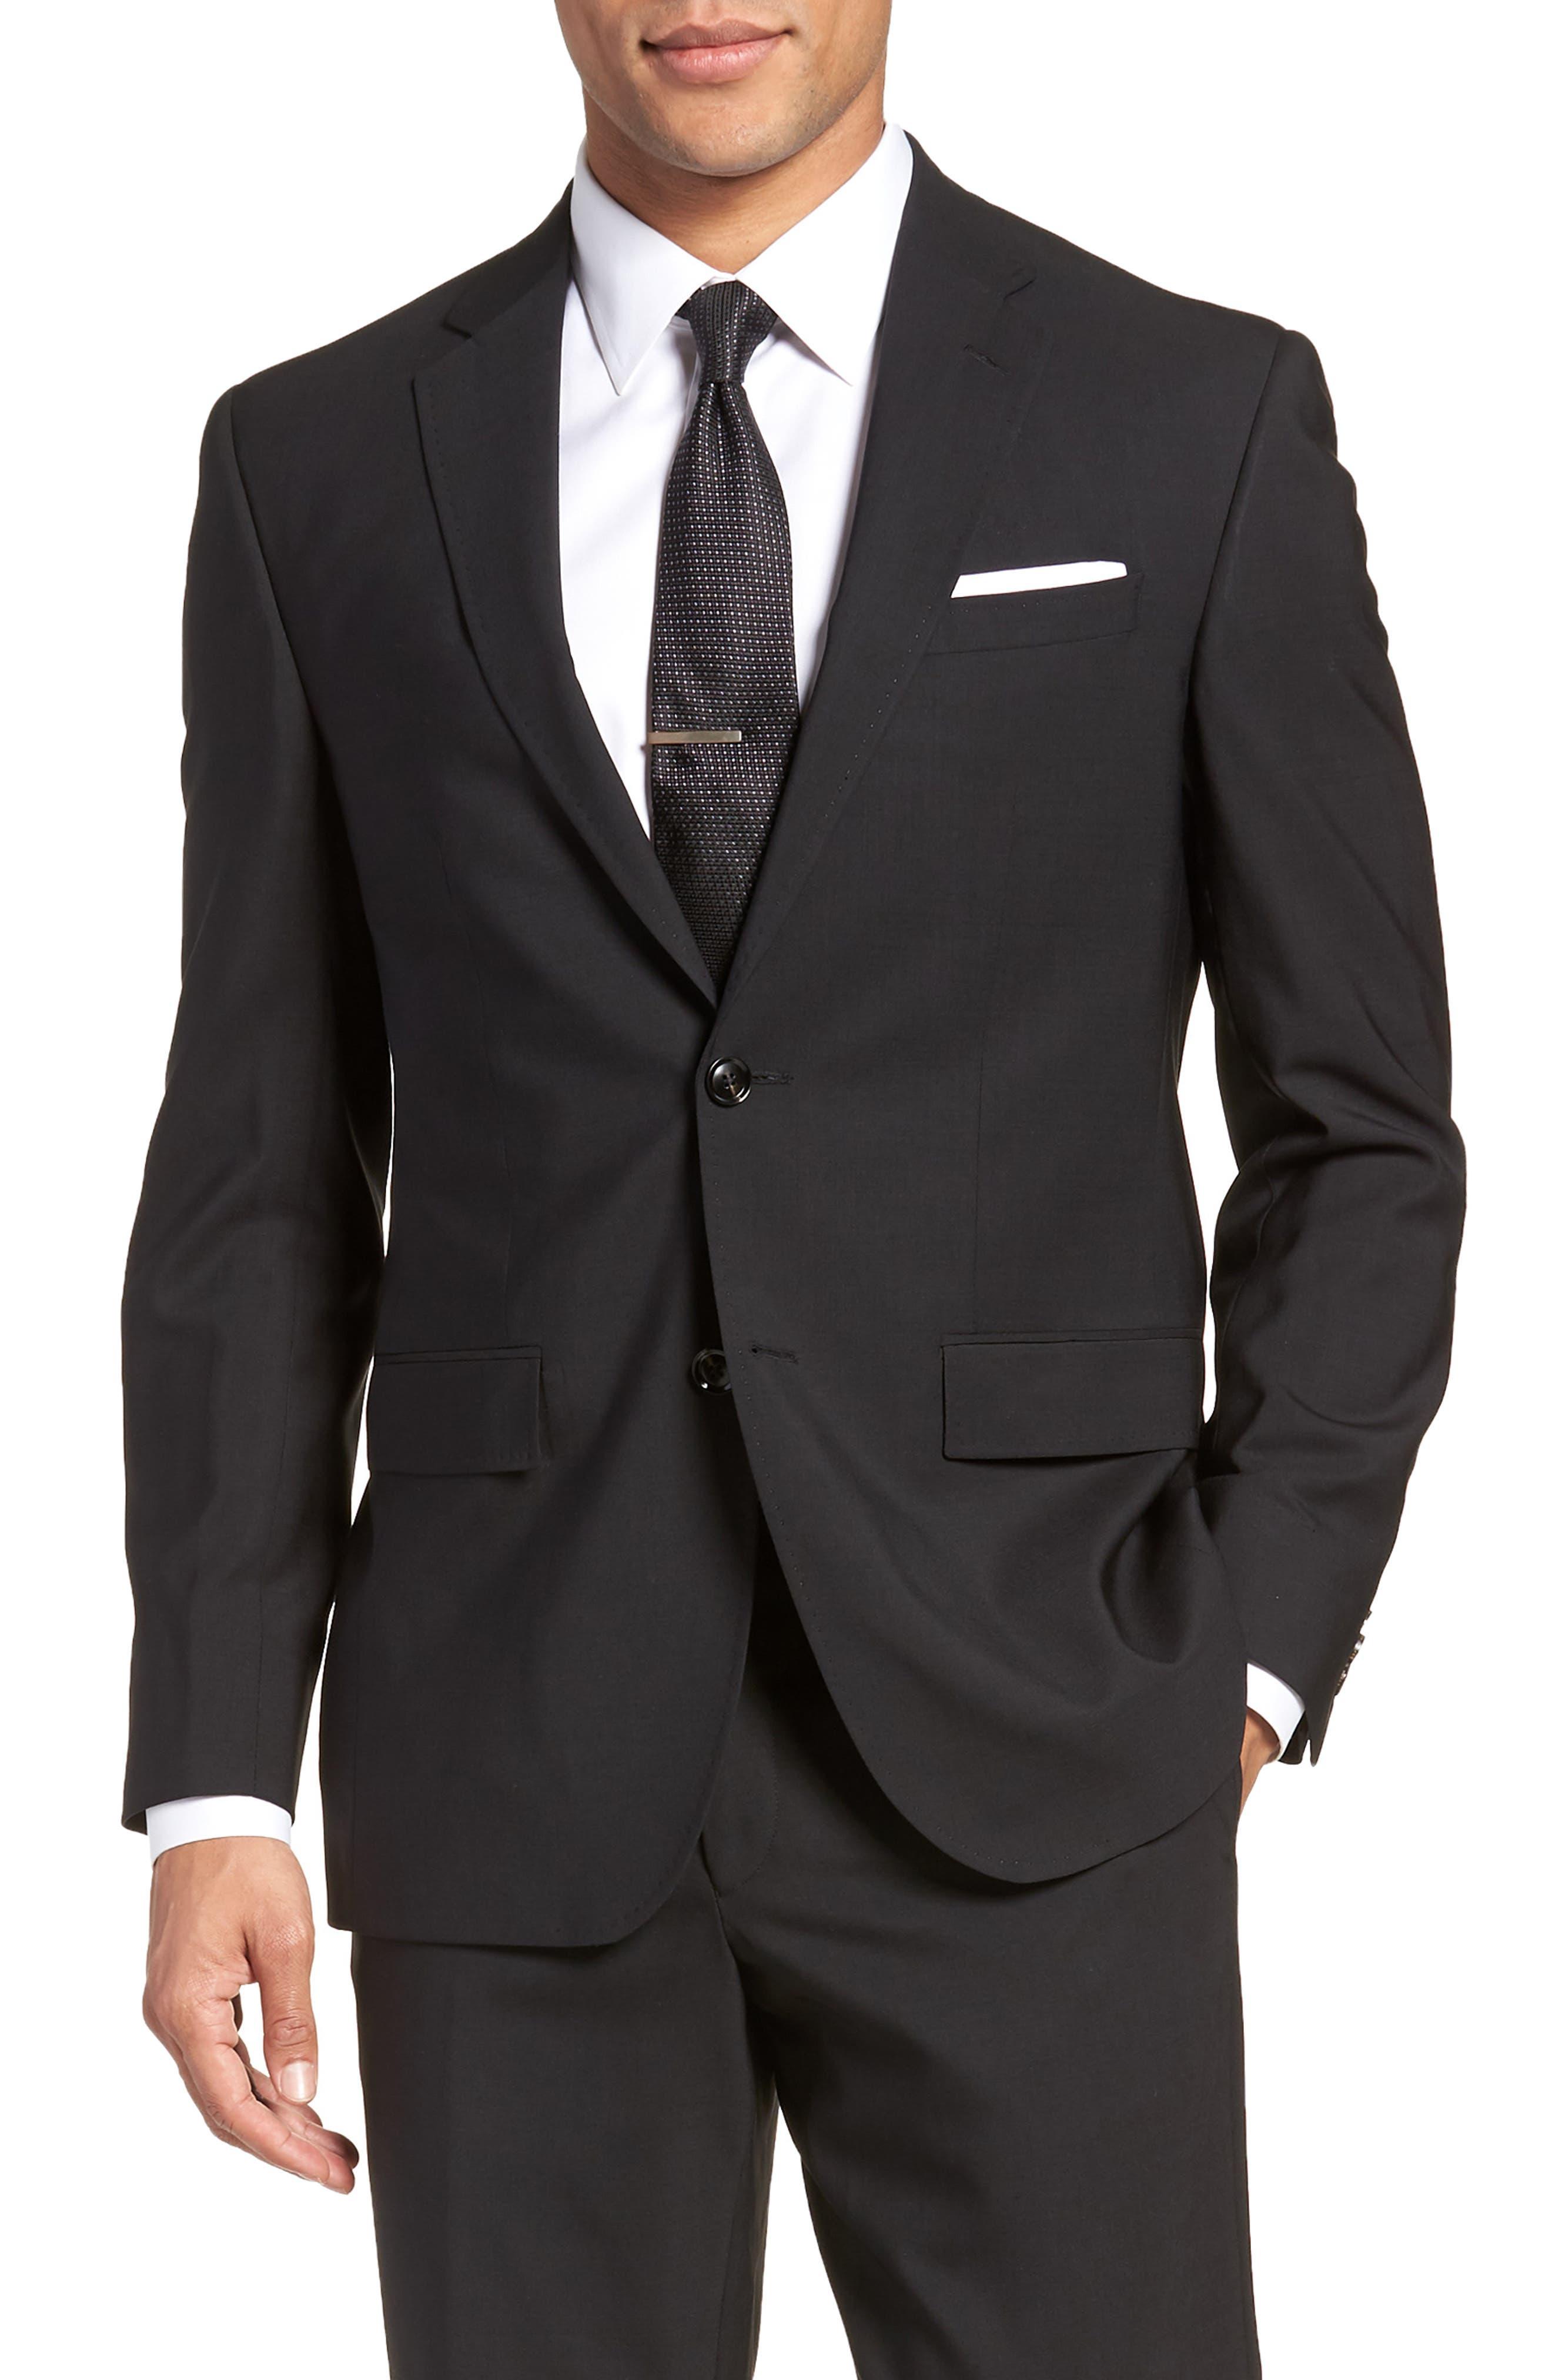 Jay Trim Fit Solid Wool Suit,                             Alternate thumbnail 5, color,                             Black